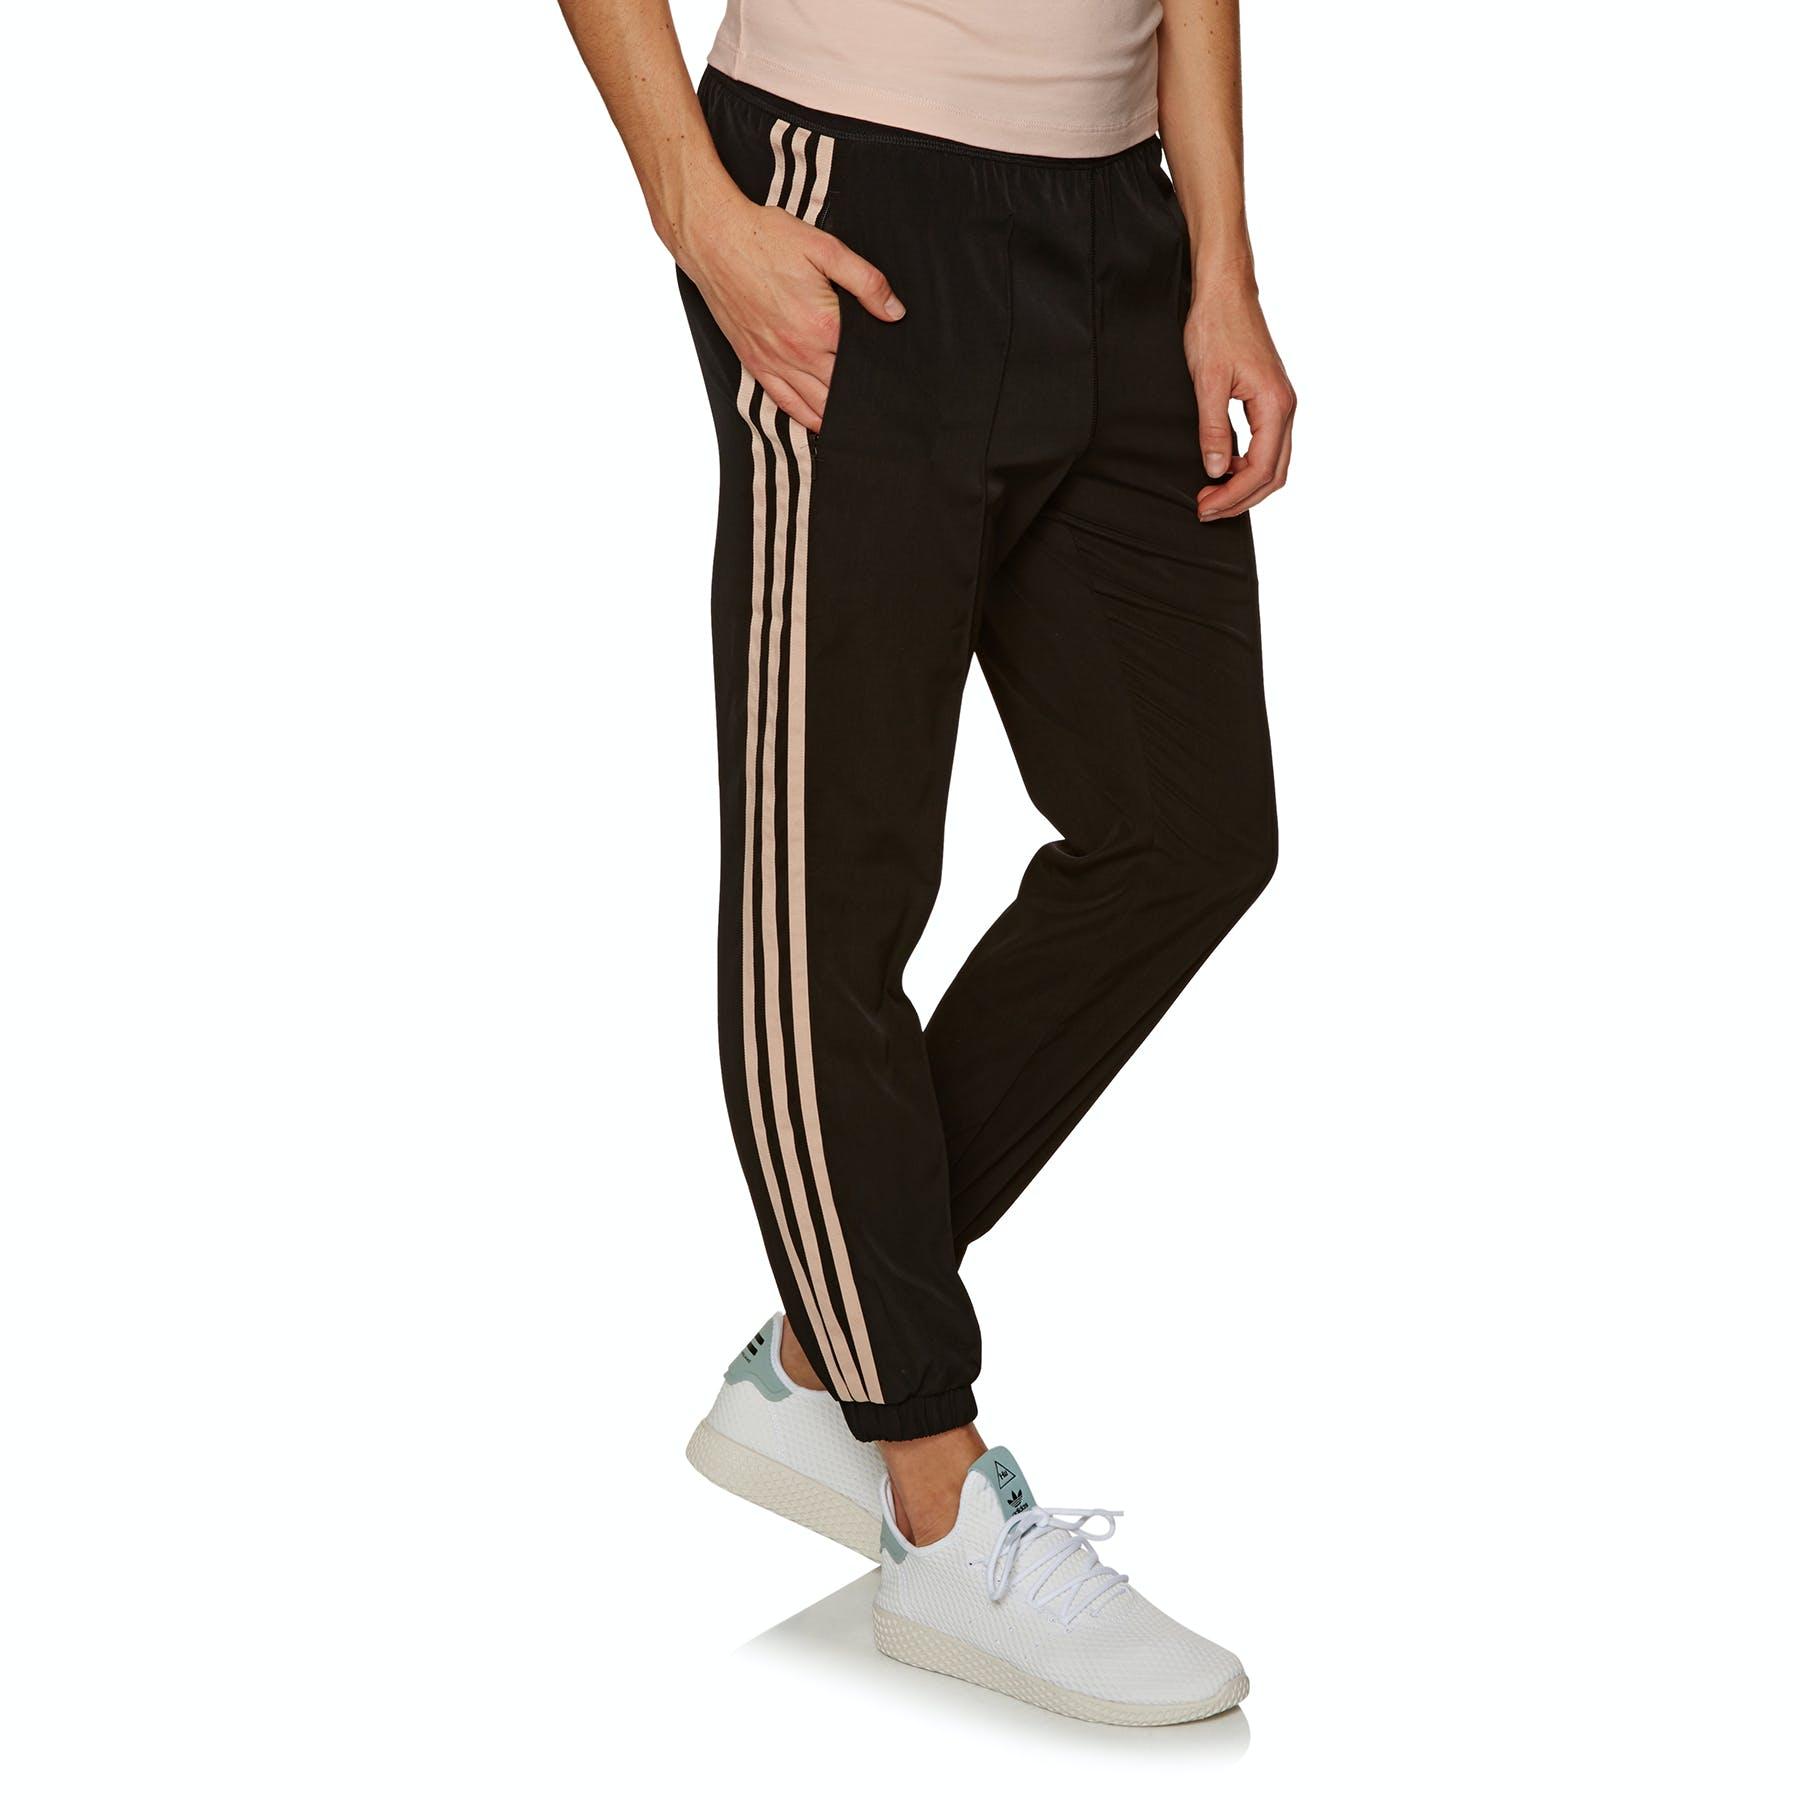 Adidas Originals Aa42 Womens Loungewear